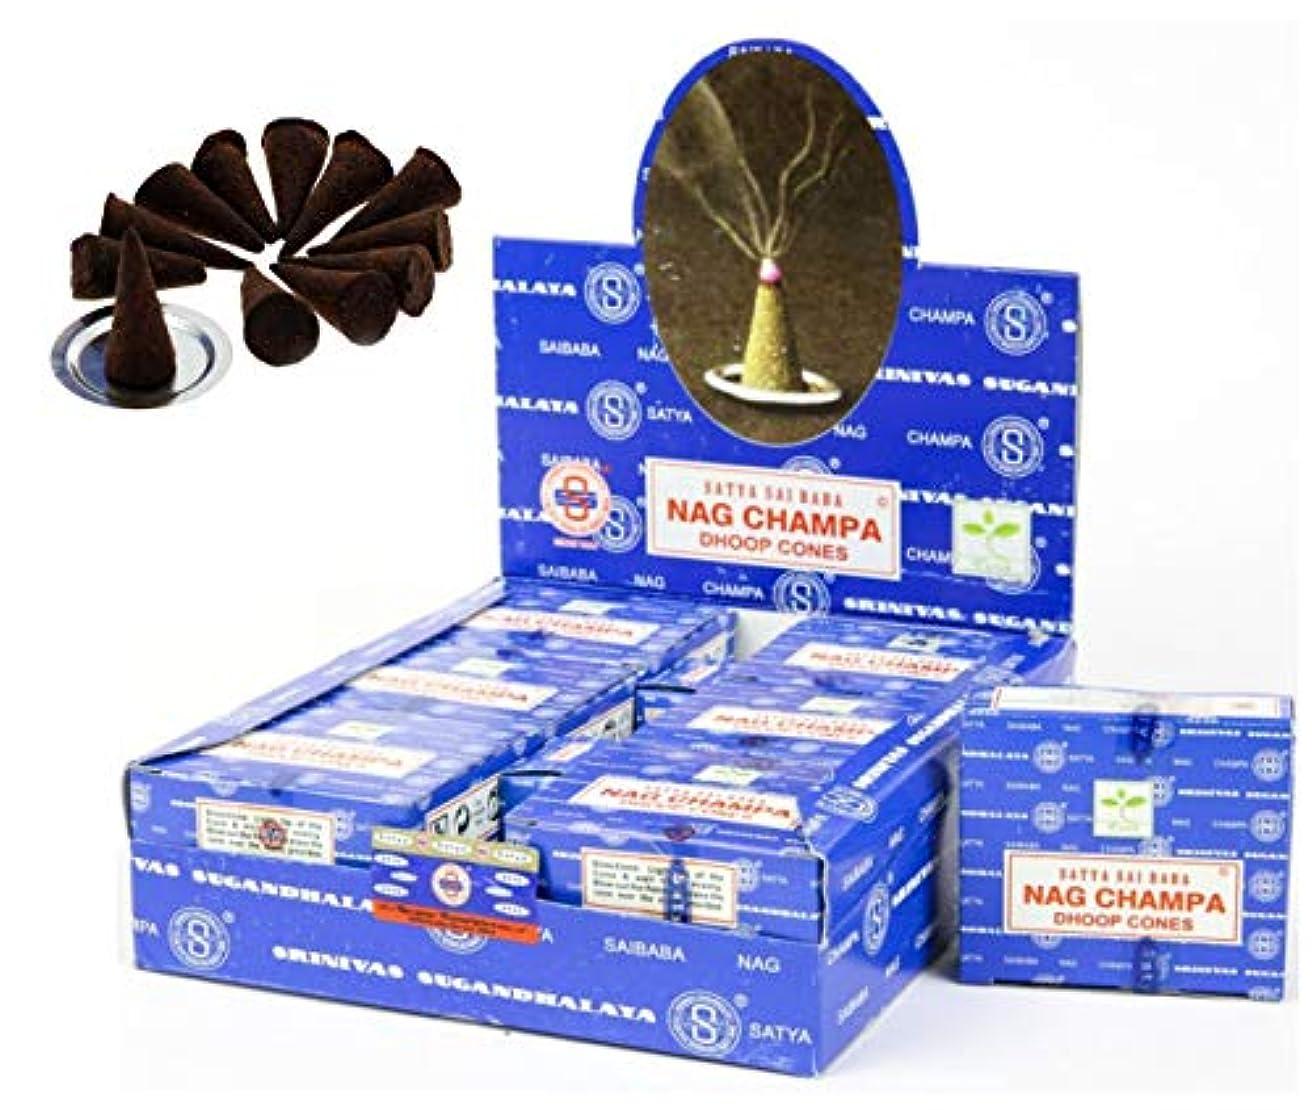 Craftozone Satya Sai Baba Nag Champa Agarbatti 12個パック 香り